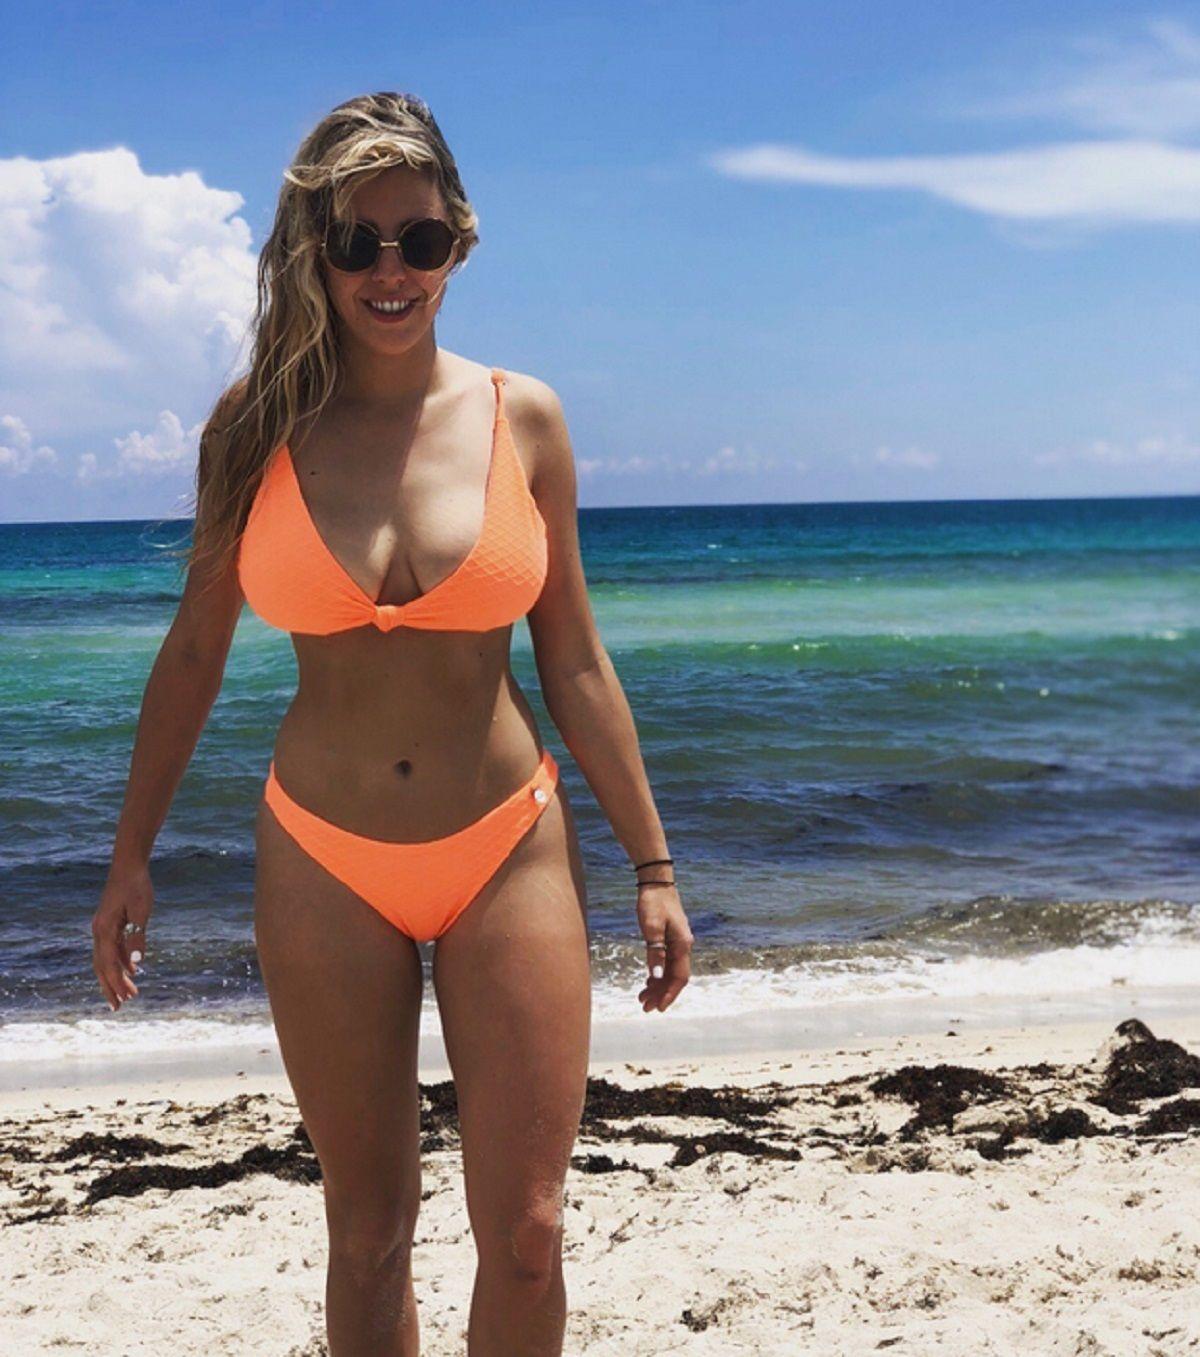 La foto de Nati Jota en la playa sin Photoshop: En un momento me tapaba las estrías